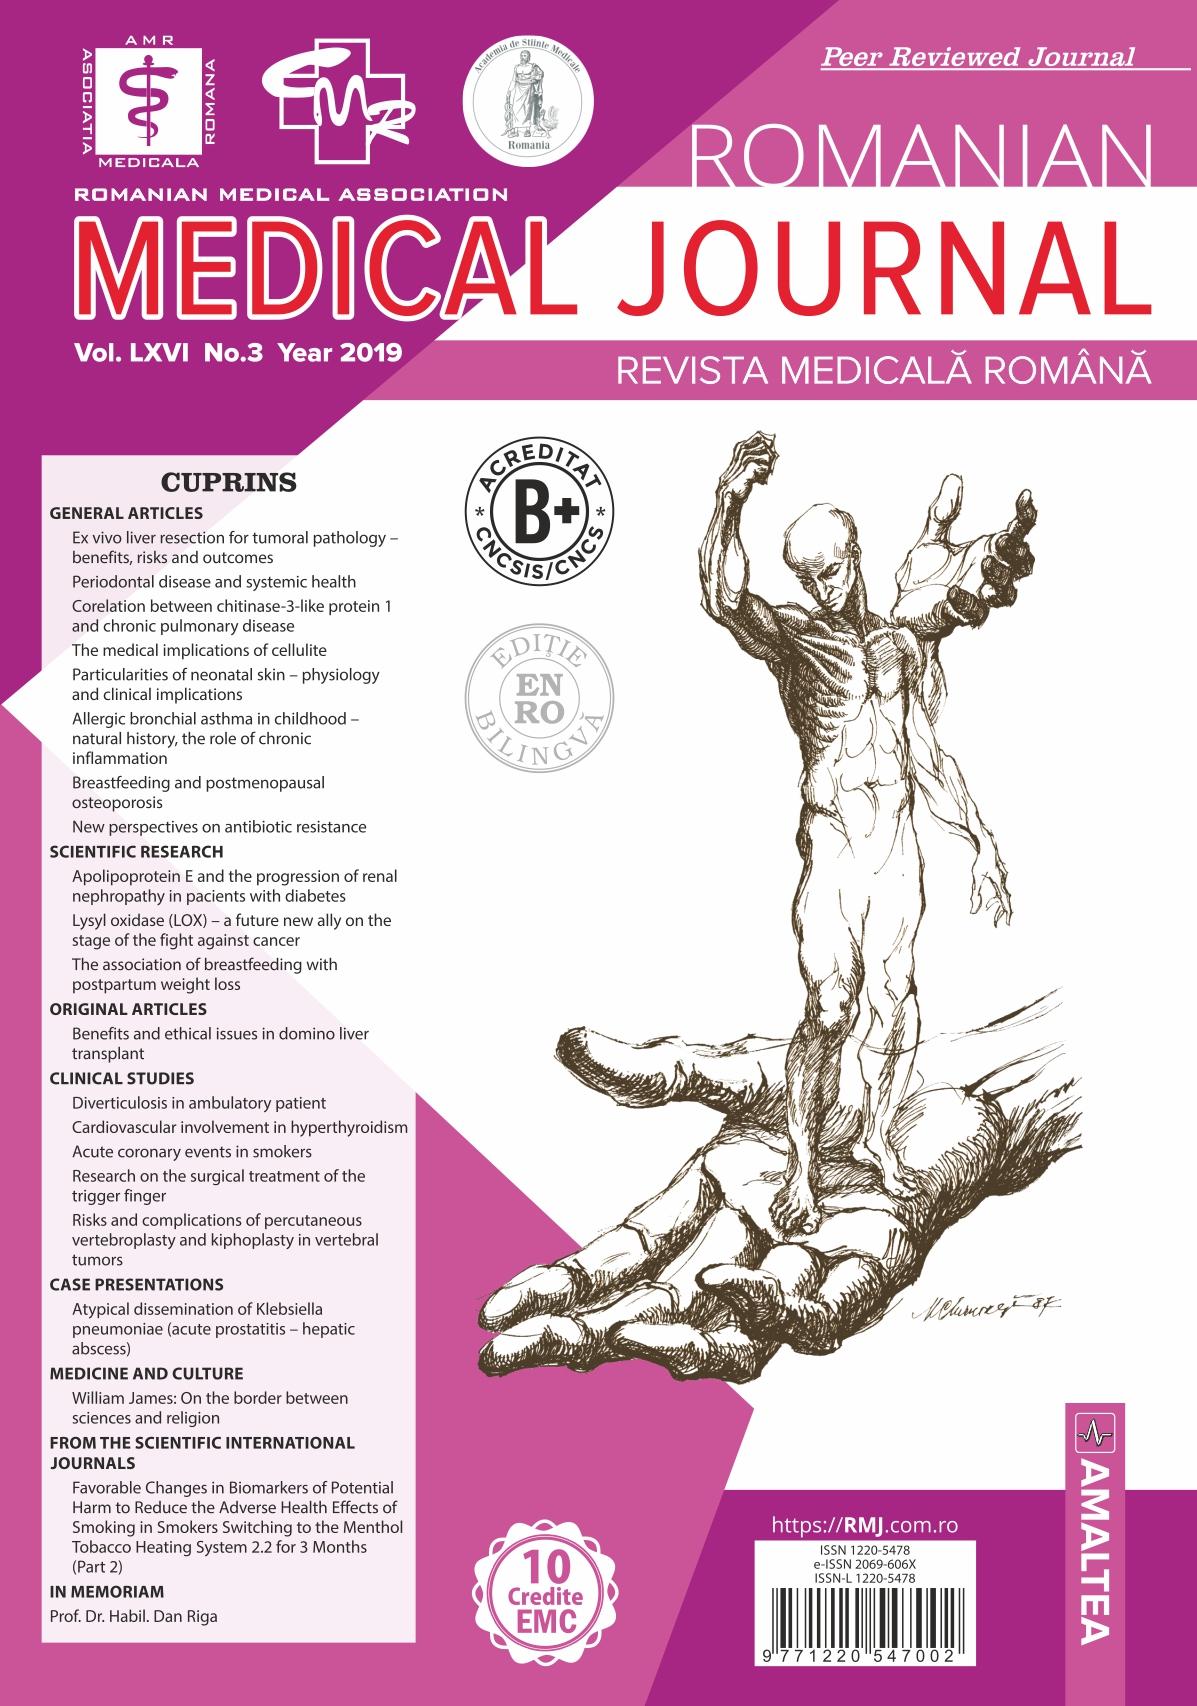 REVISTA MEDICALA ROMANA - Romanian Medical Journal, Vol. LXVI, No. 3, Year 2019